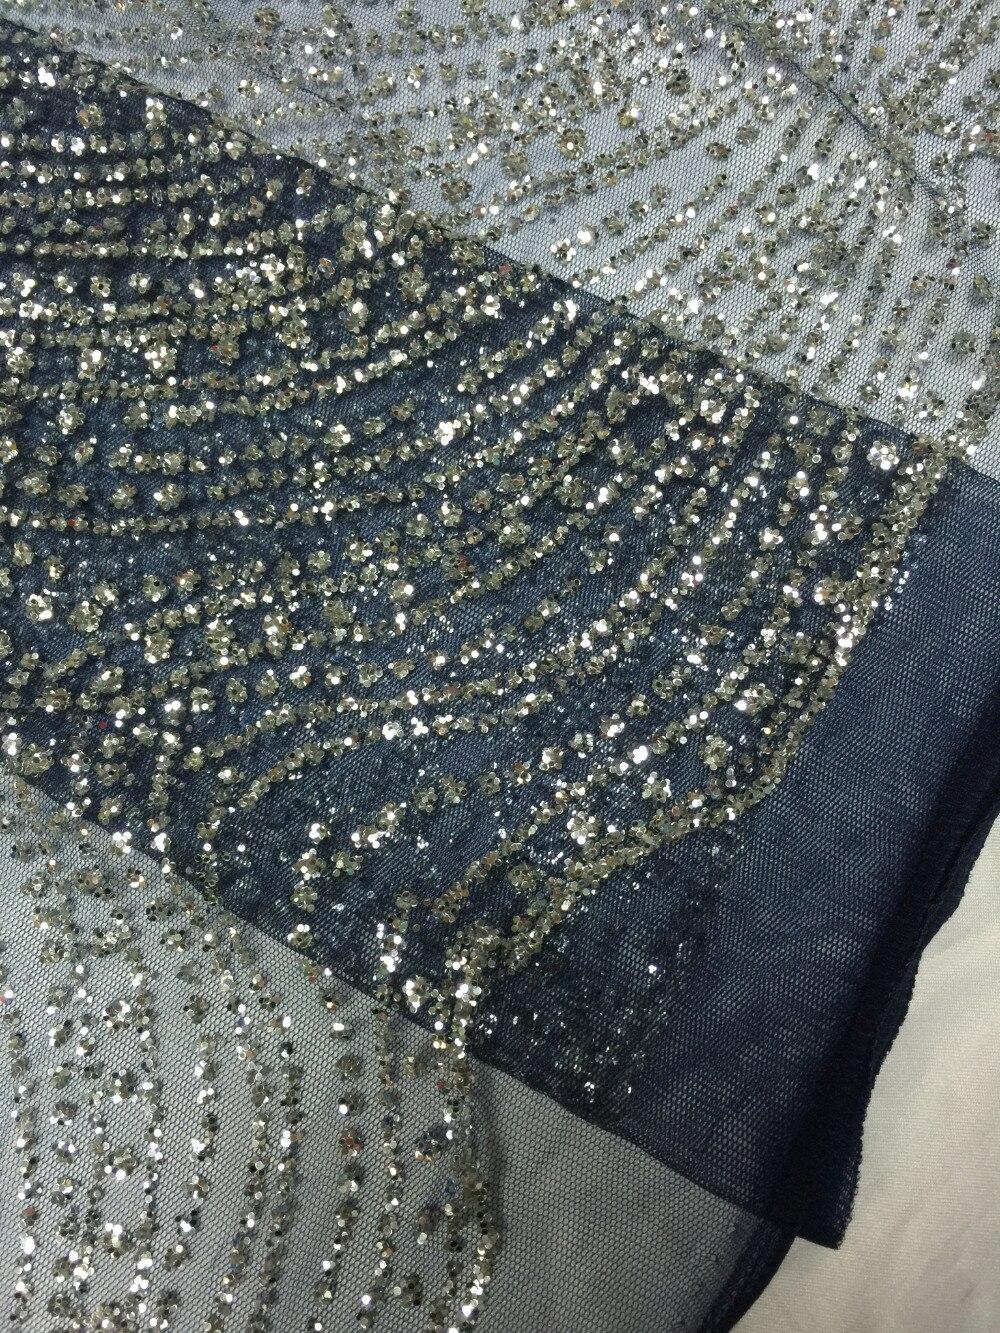 R 22562 35 De Desconto2017 De Alta Qualidade Tule Francês Lace Tecido Africano Glitter Lantejoulas Glitter Tecido De Renda Líquida Para O Vestido